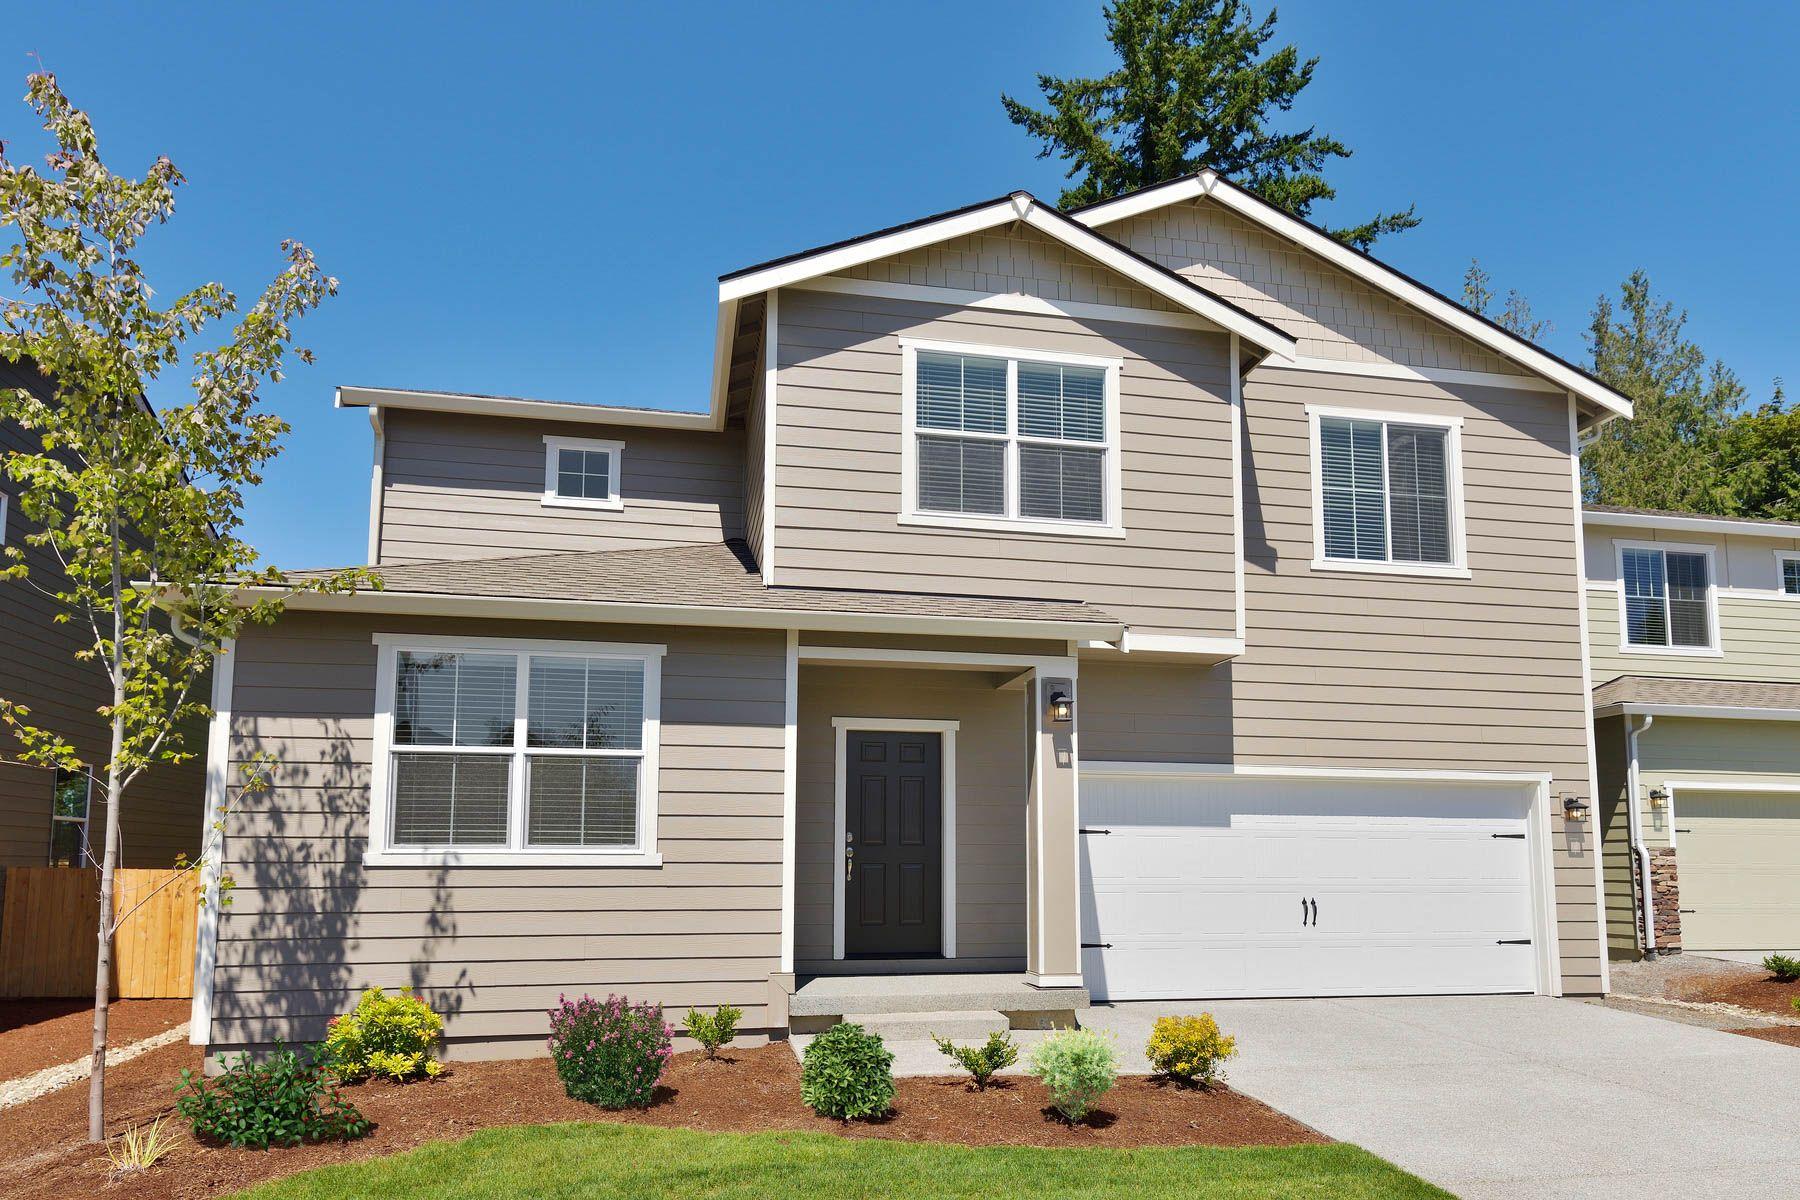 The Mercer by LGI Homes at Cedar Hill Estates:The Mercer by LGI Homes at Cedar Hill Estates